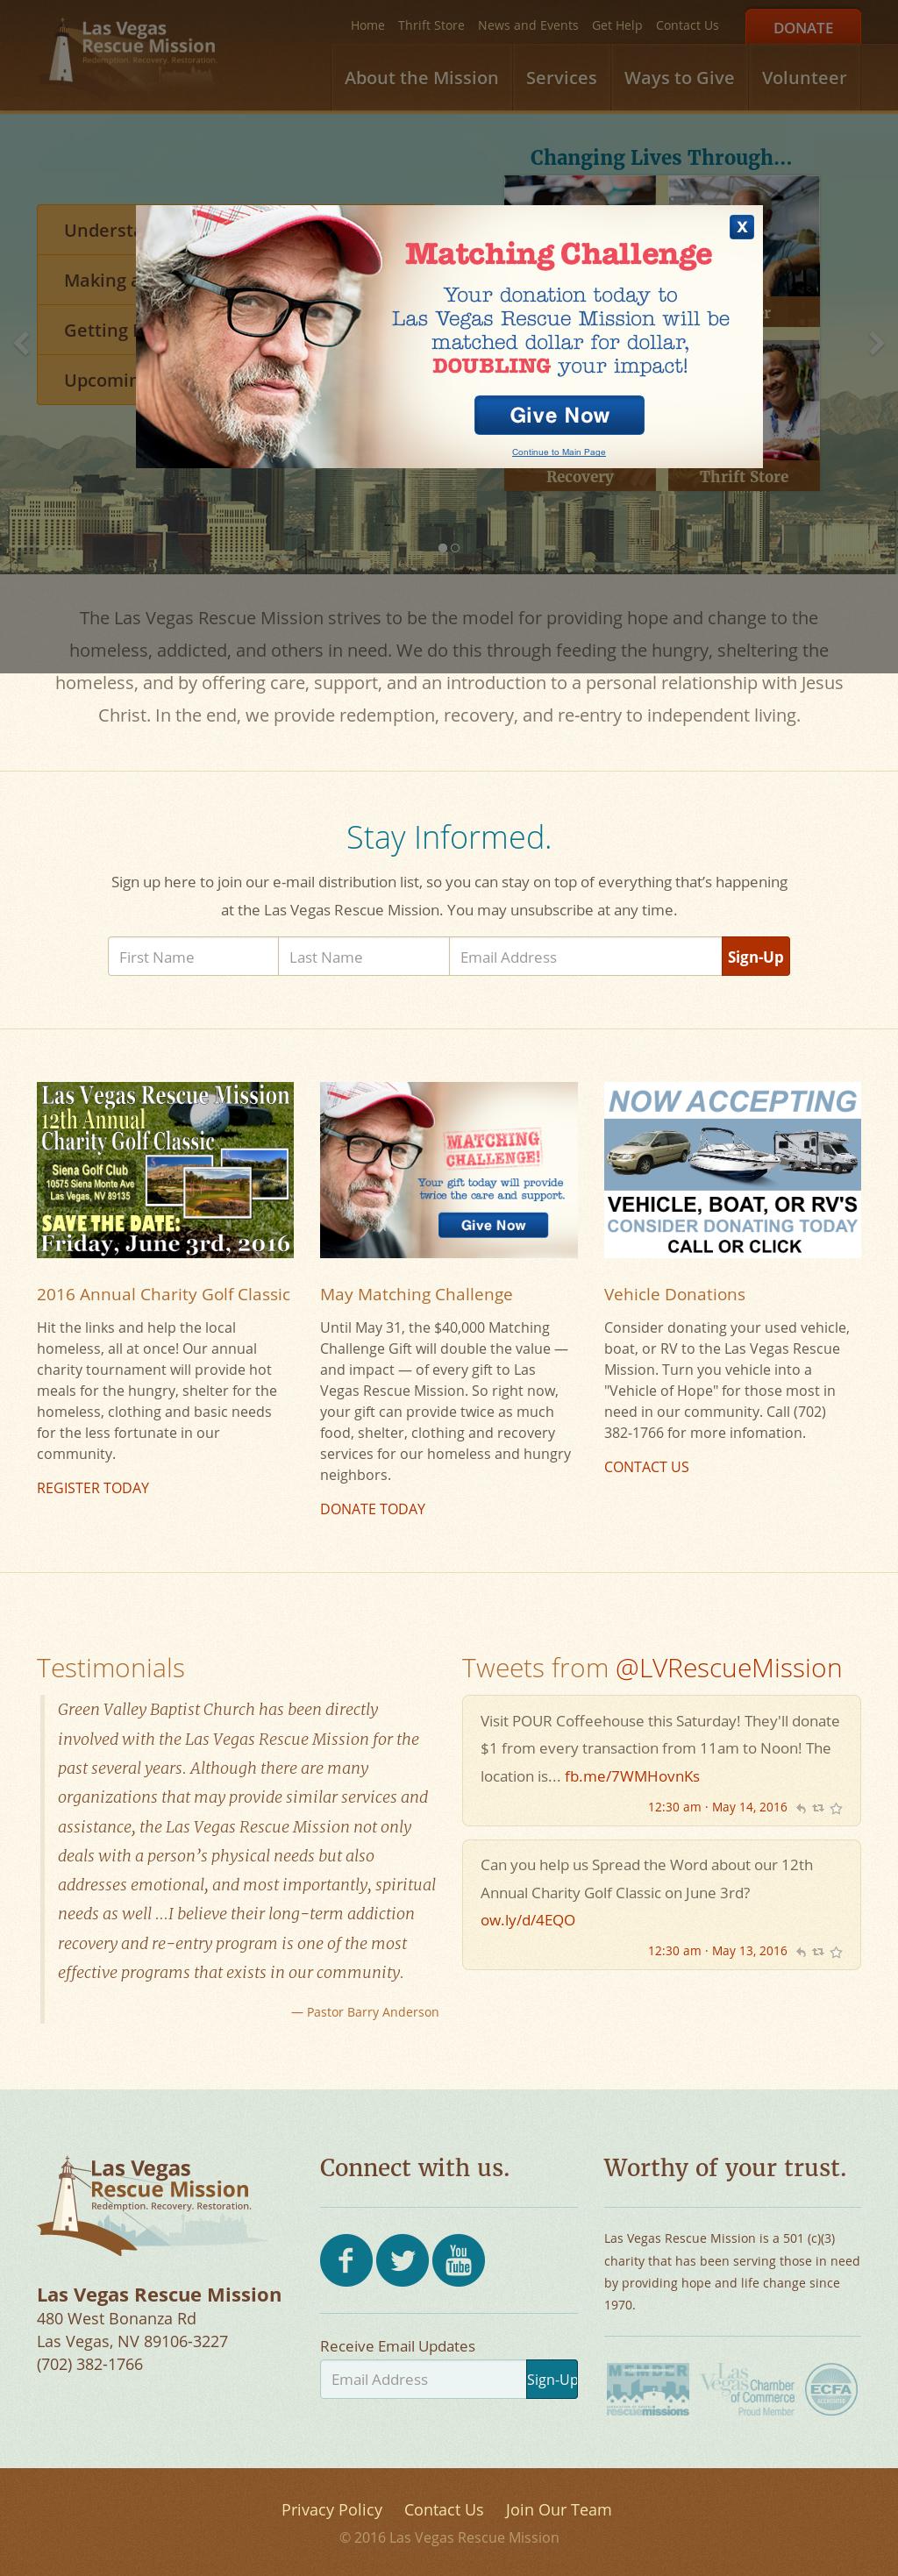 Las Vegas Rescue Mission Competitors, Revenue and Employees